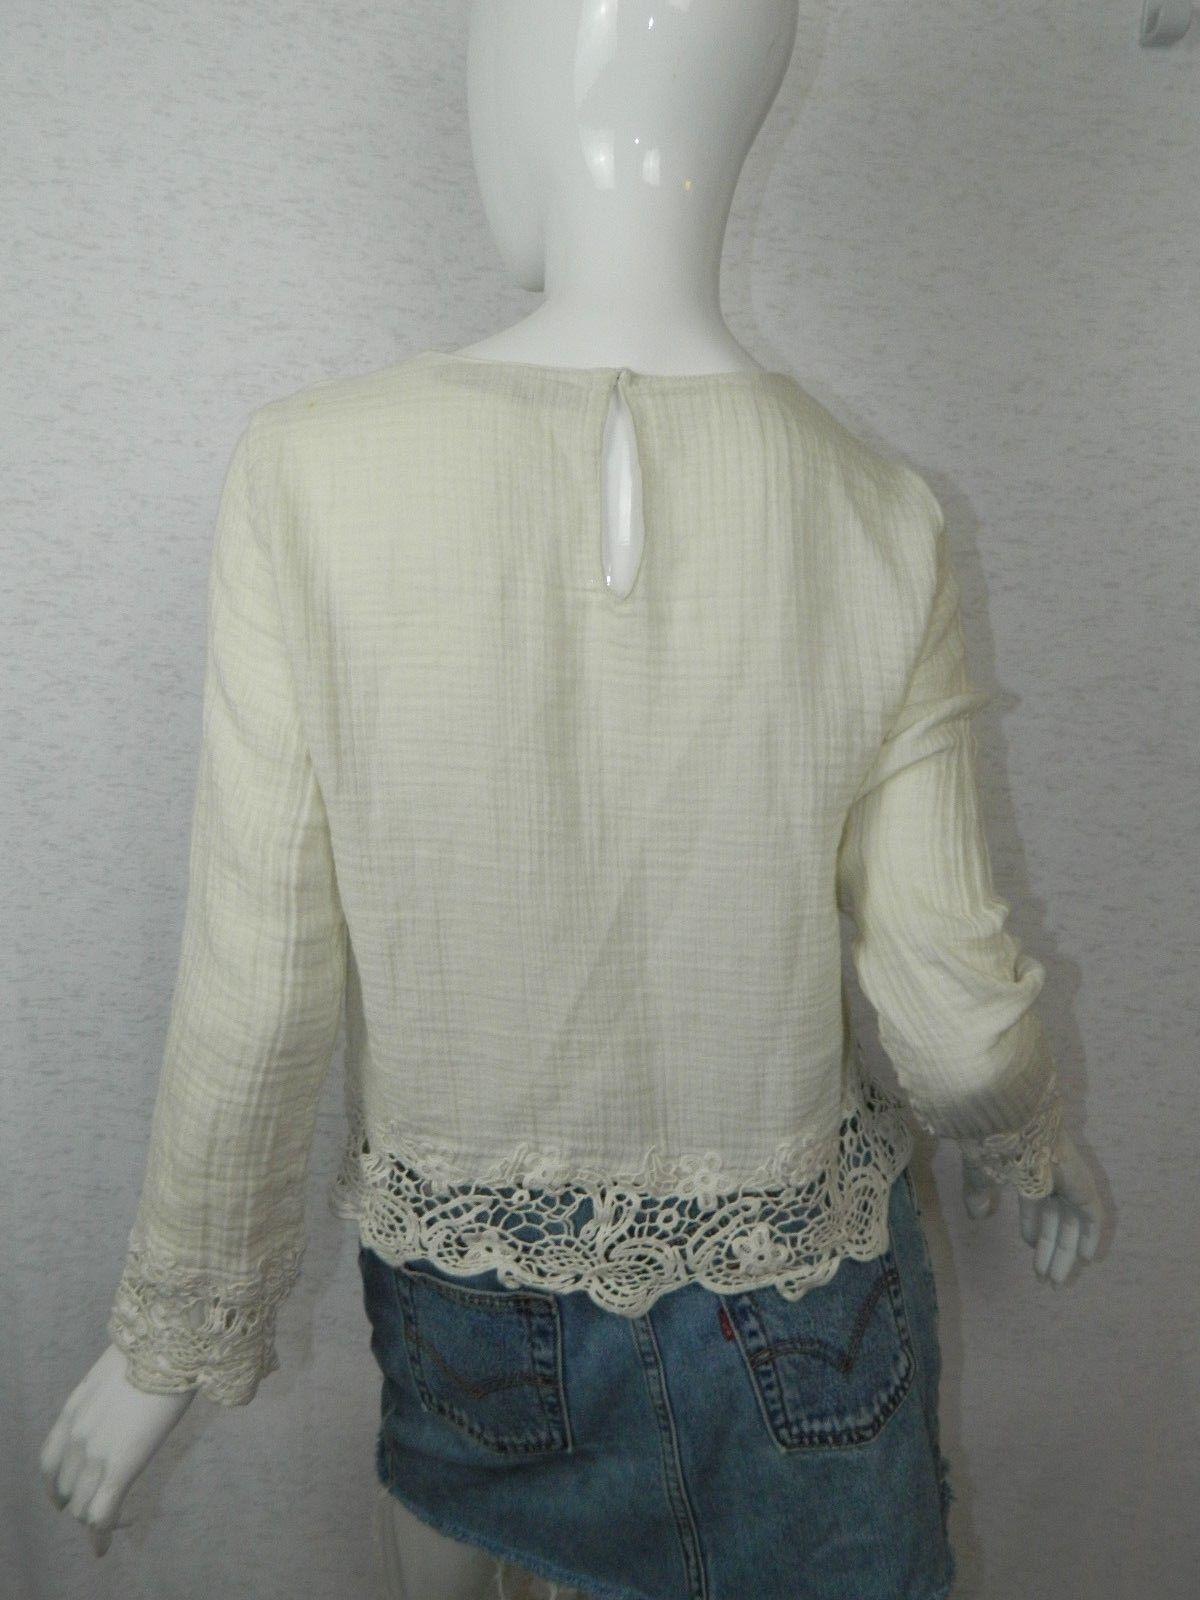 c0149ec1 ZARA Shirt Ivory White Embroidered Crochet Romantic Boho Blouse Size Medium